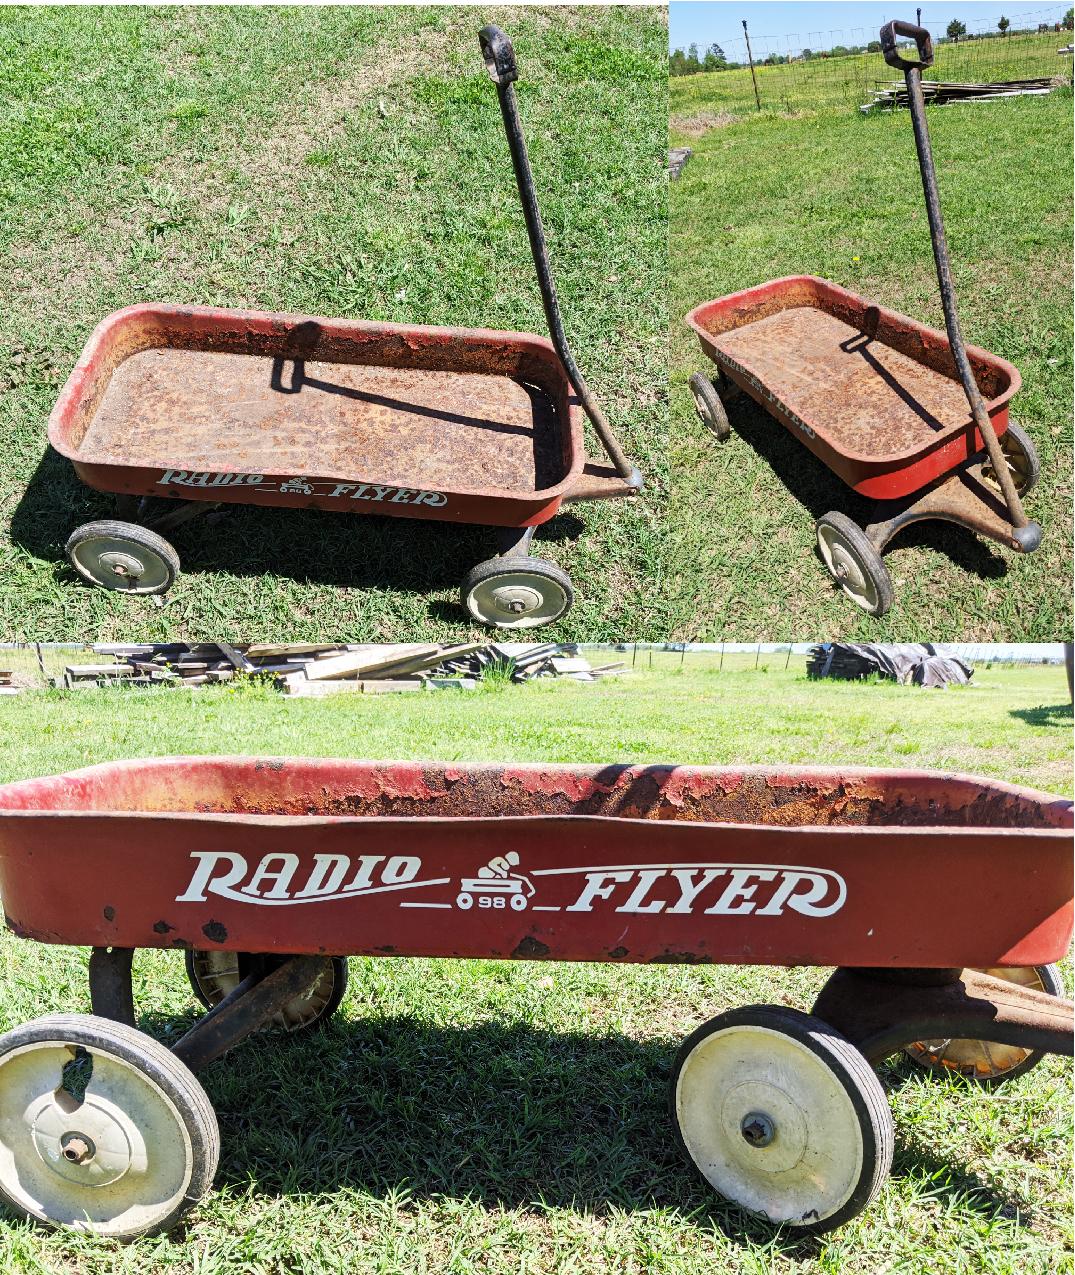 Classic Full-Sized Radio Flyer Wagon